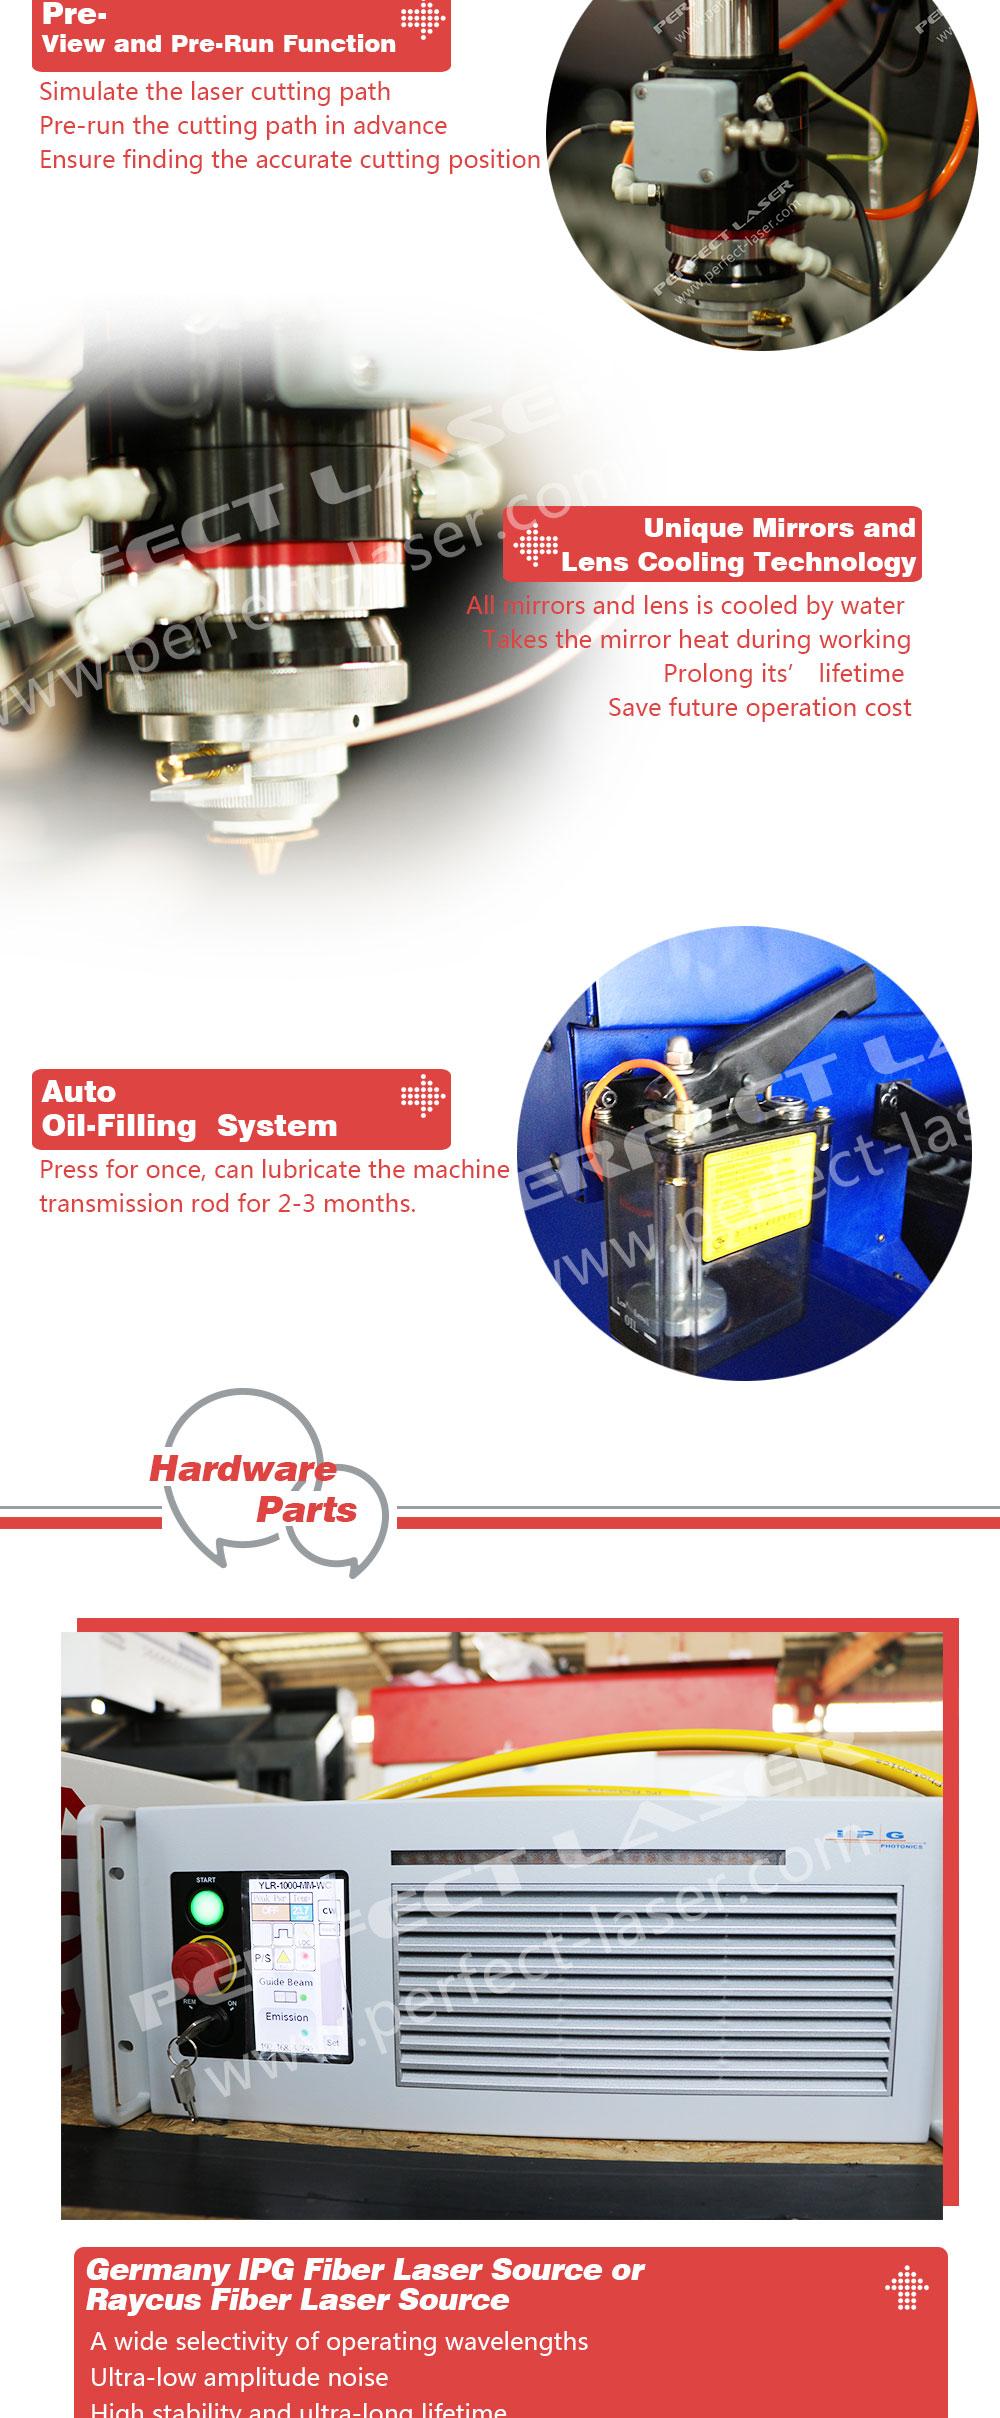 06 Perfect Laser-Fiber Laser Cutting Machine.jpg